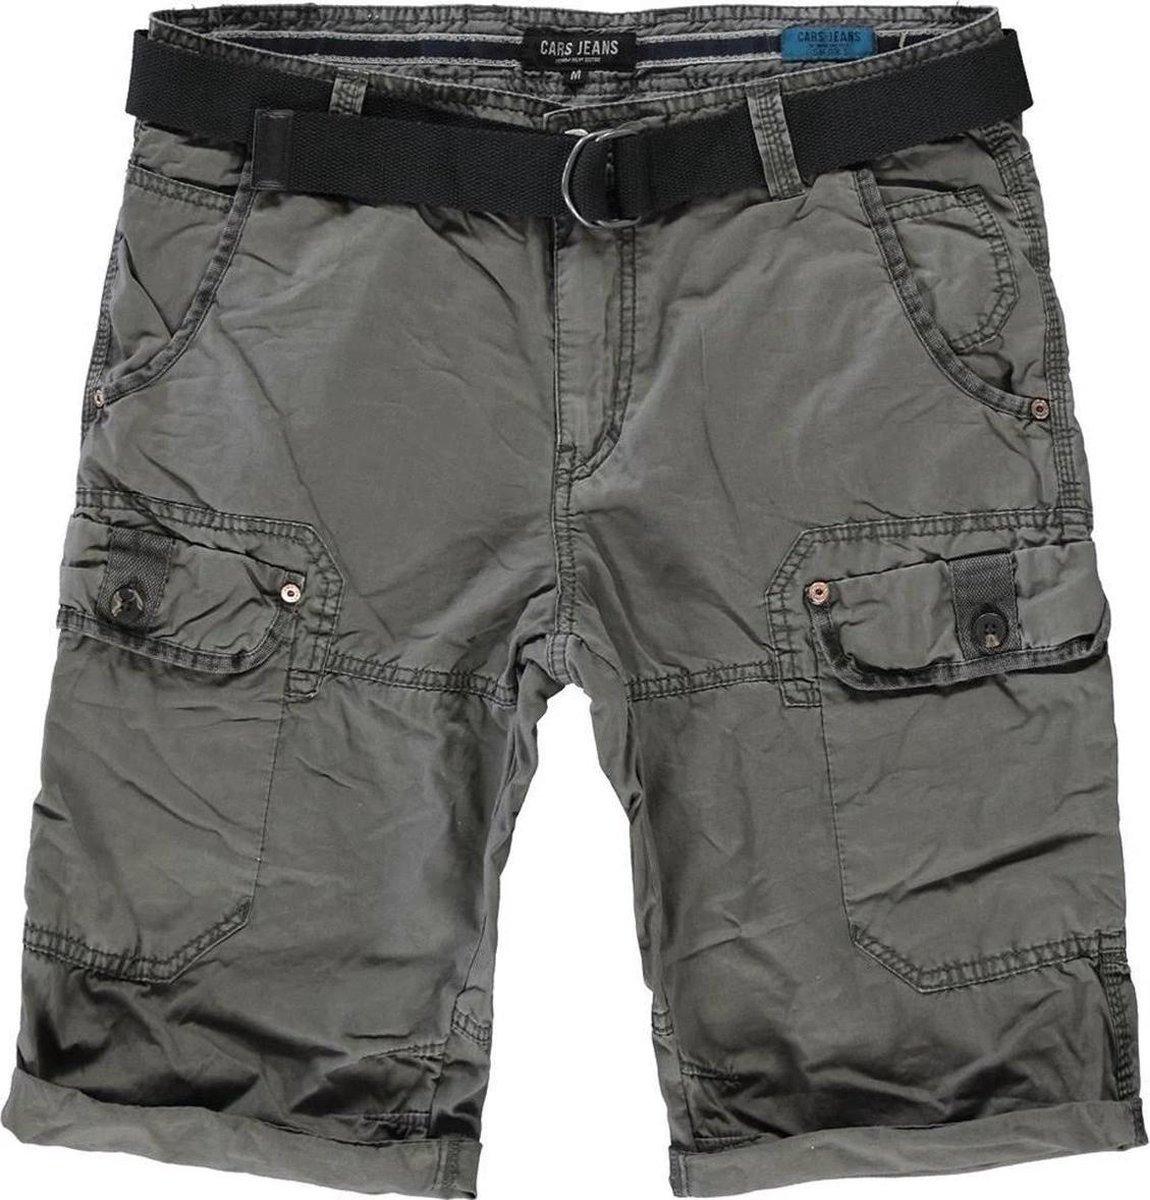 Cars Jeans - RANDOM Short Cotton - Antra - Mannen - Maat XL